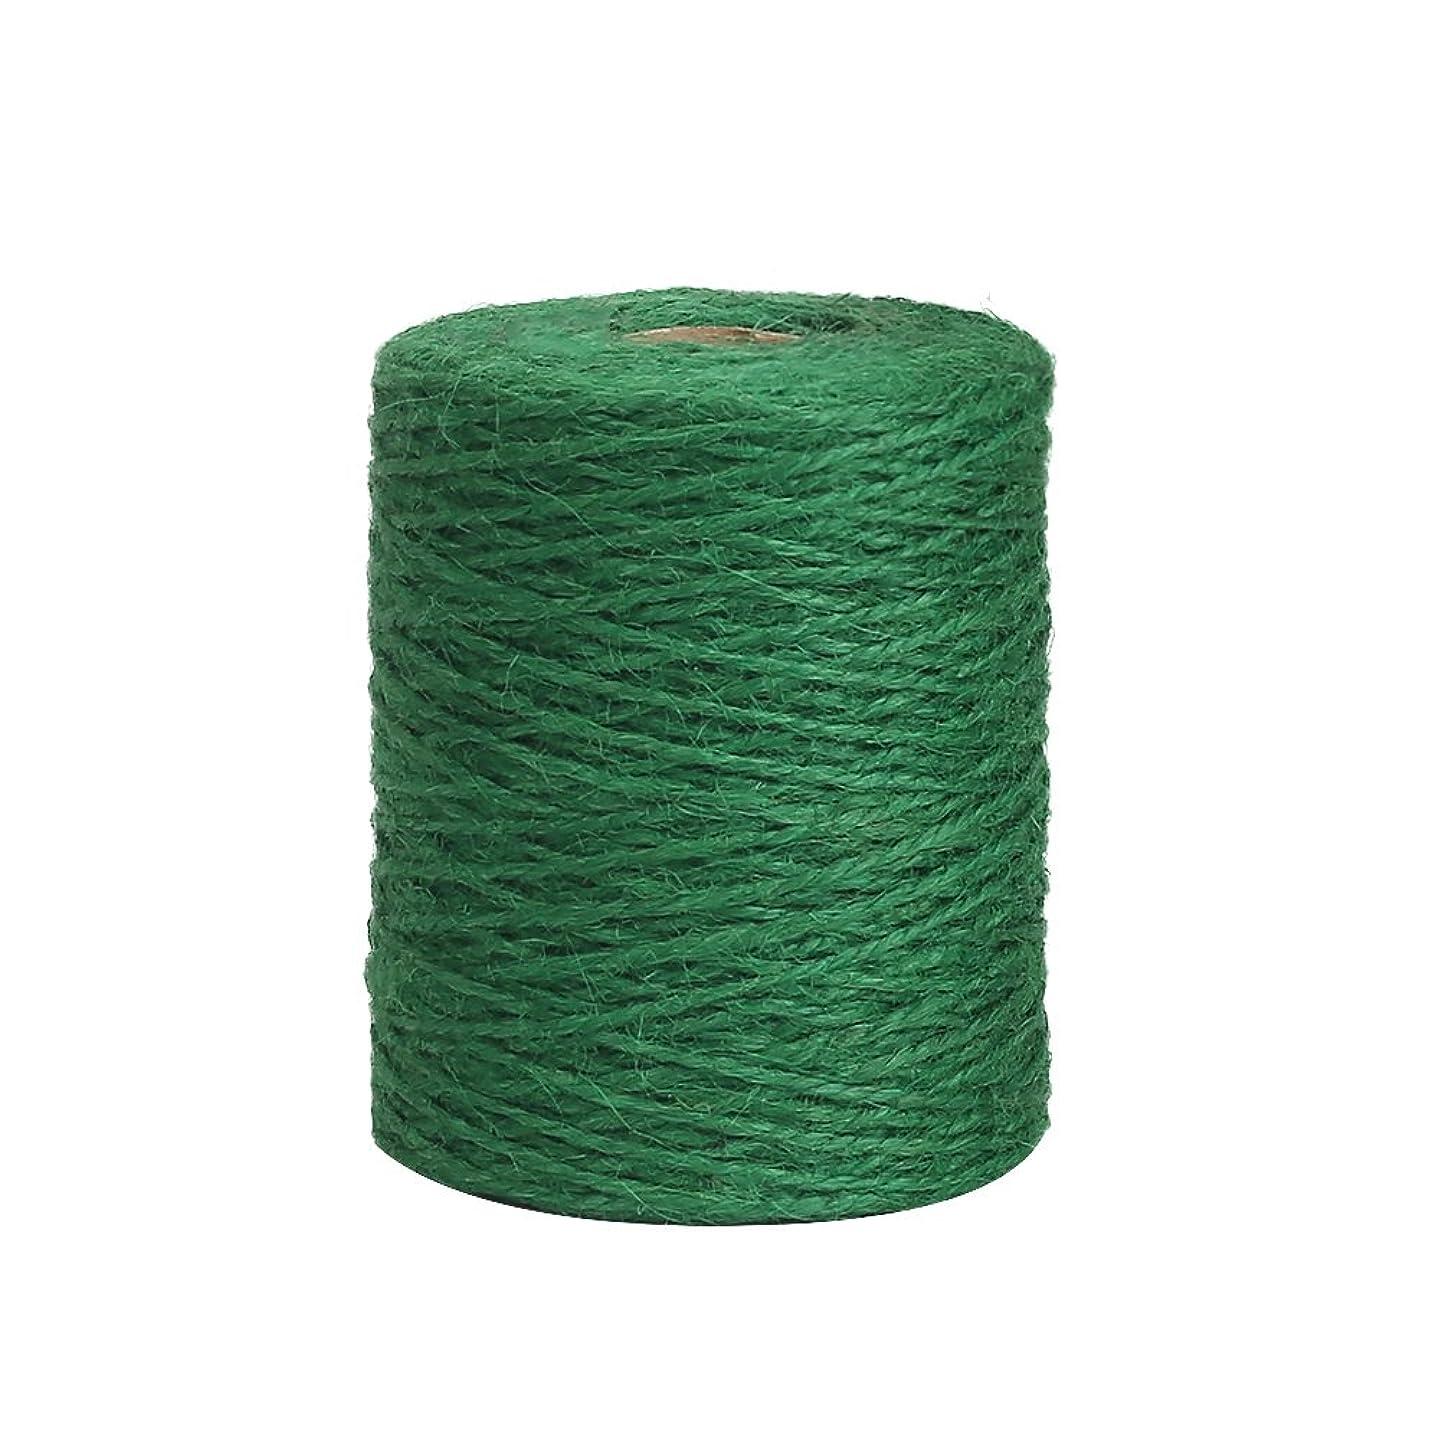 Vivifying 656 Feet Green Garden Twine, Natural 2mm Jute Twine for Floristry, Bundling, Crafts (Dark Green)